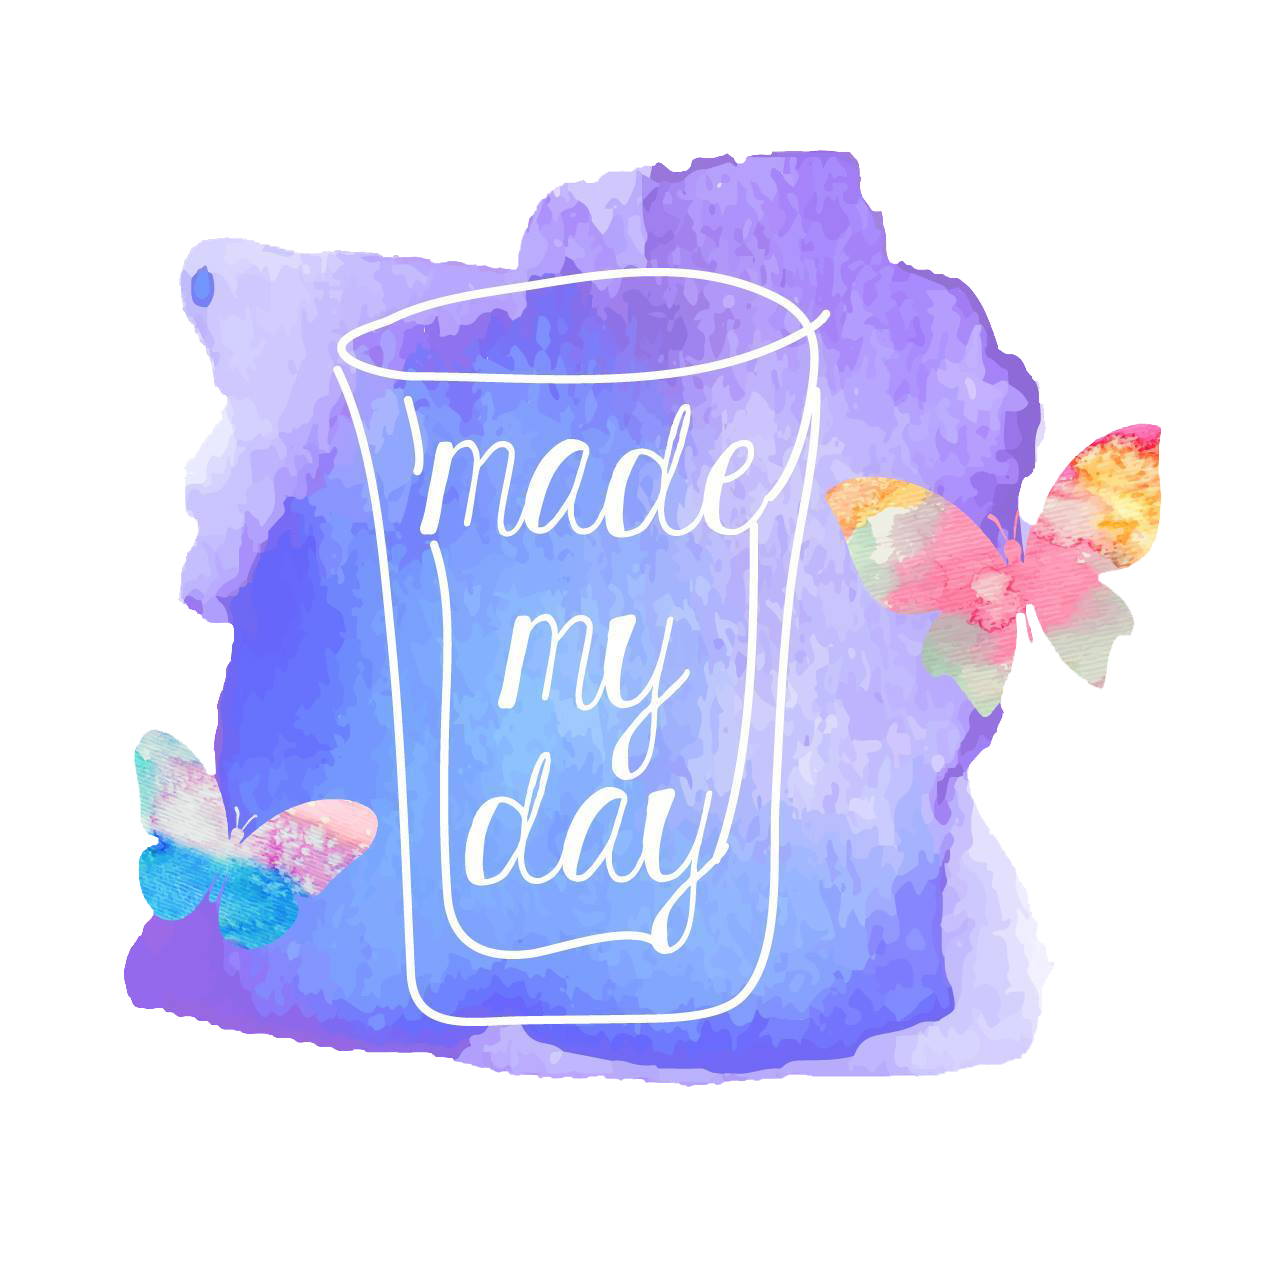 mmademydayy.com